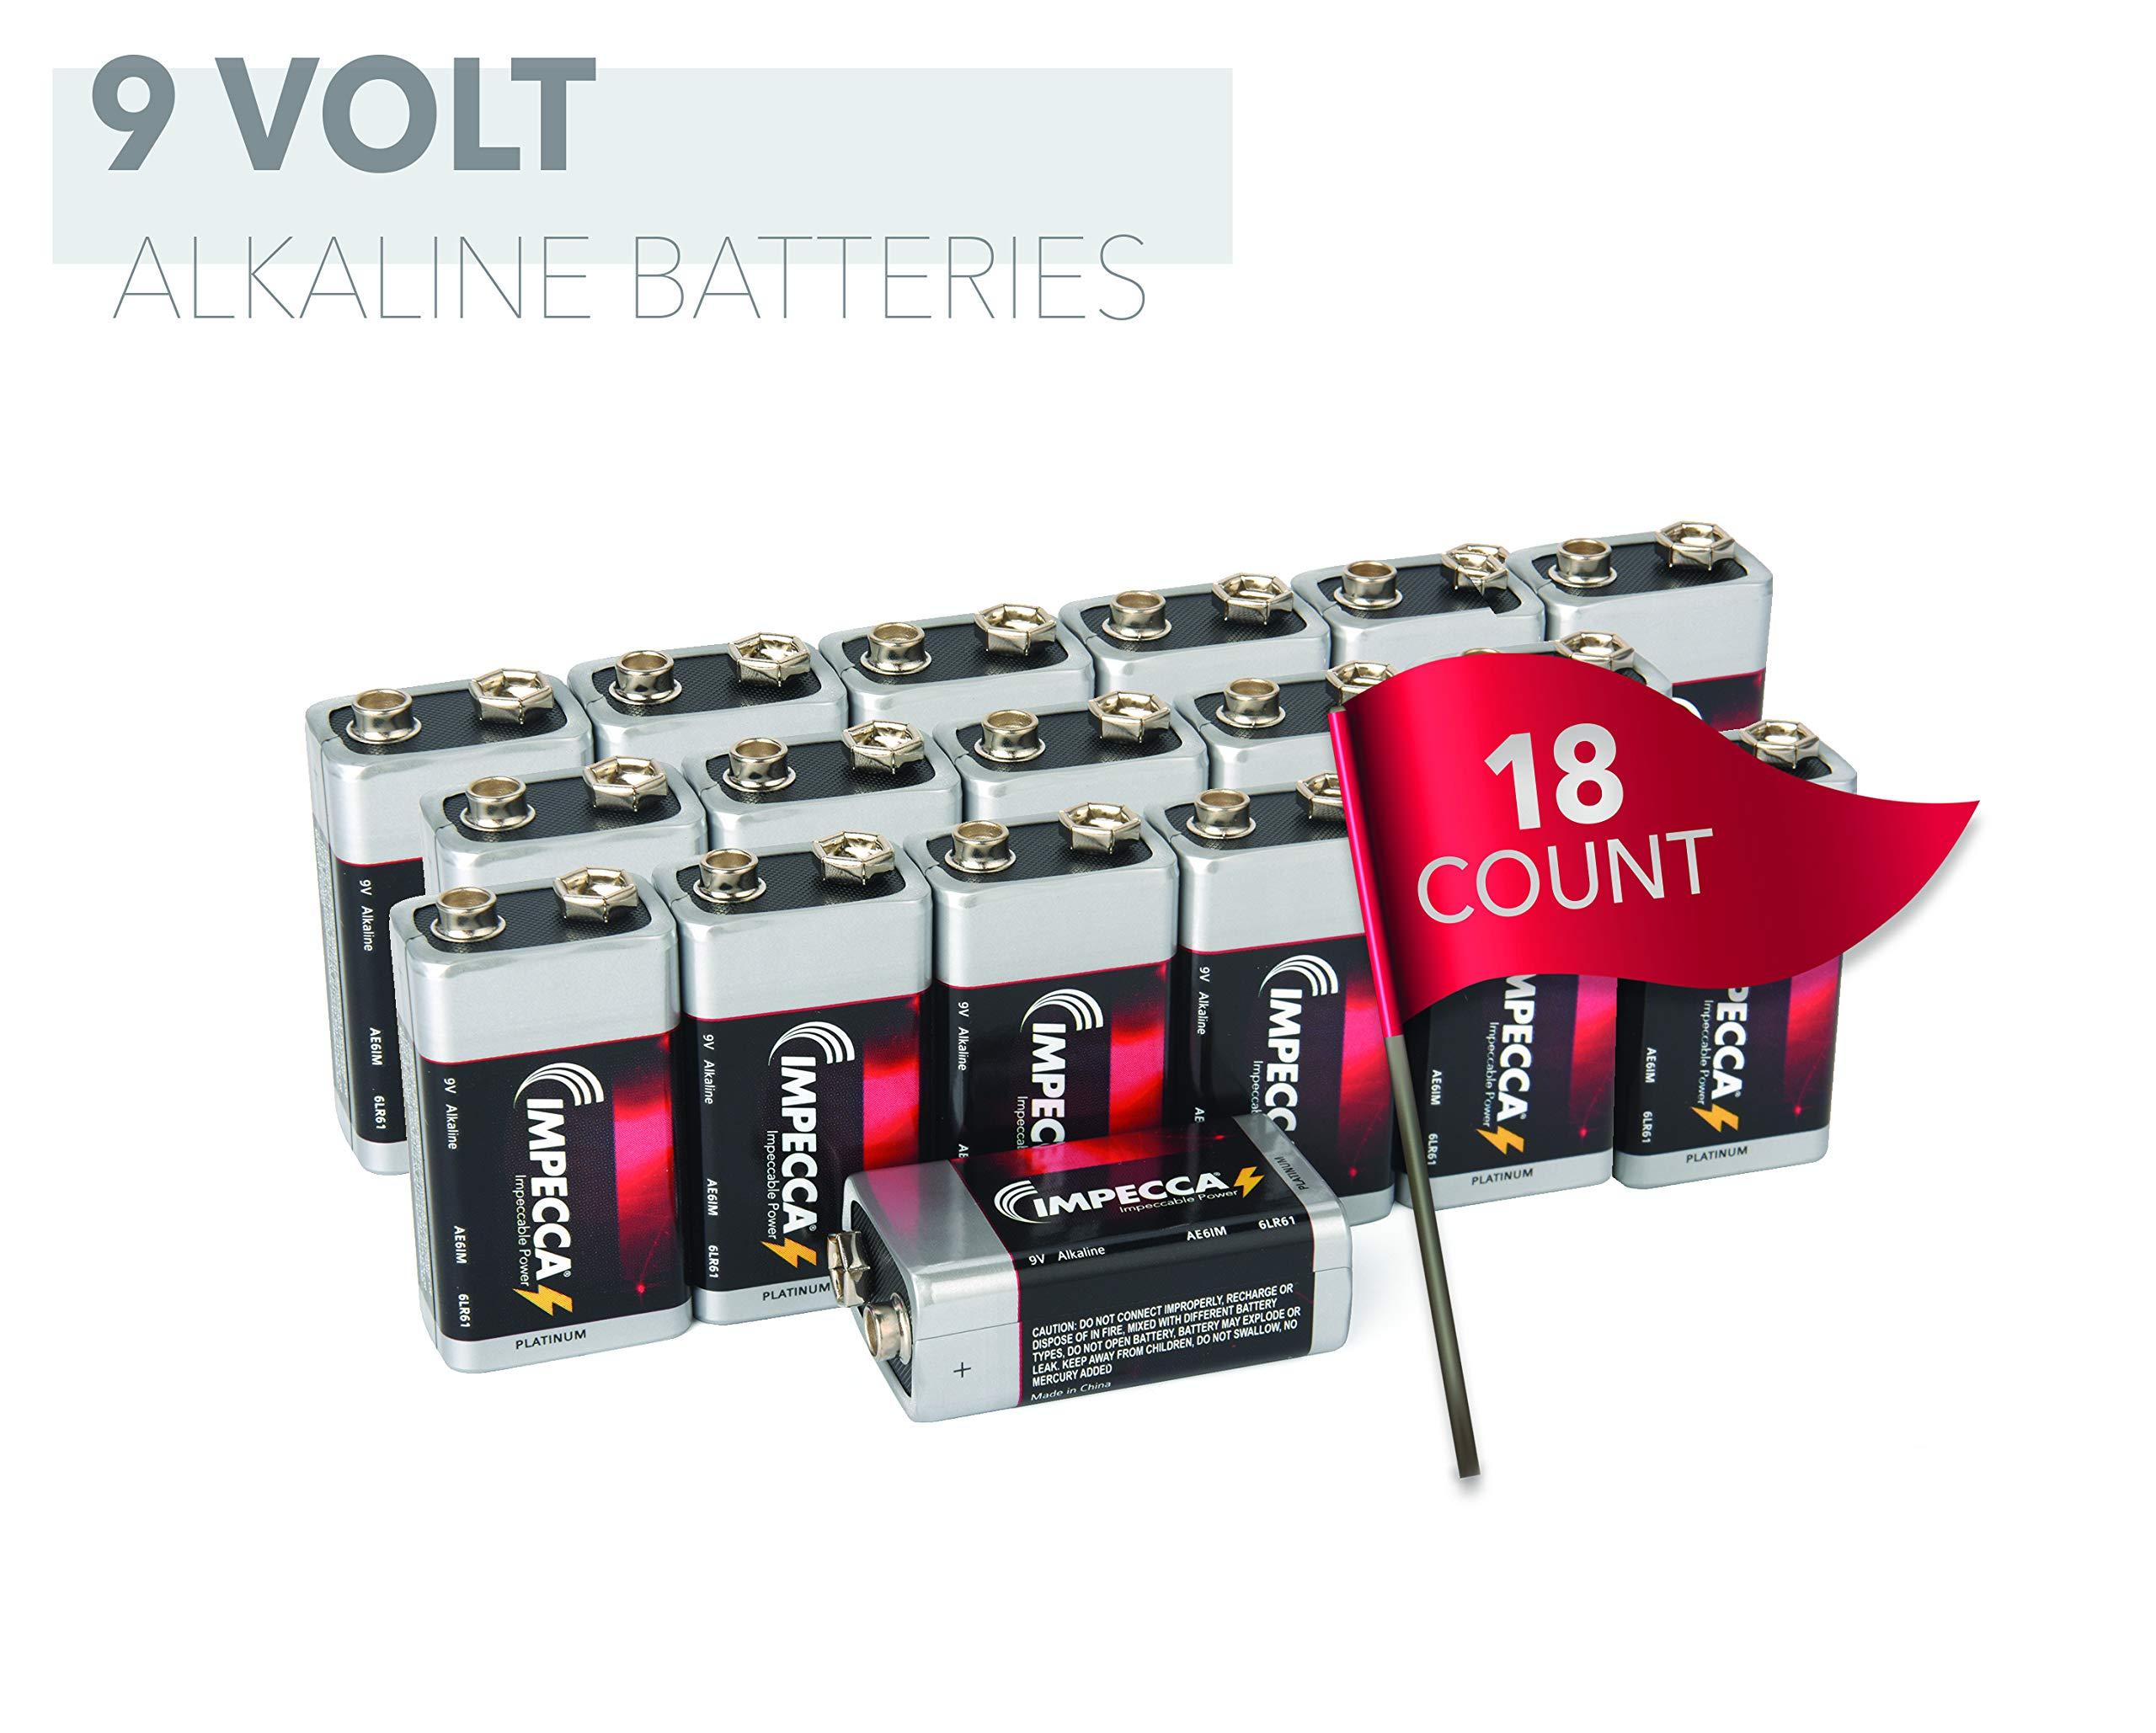 IMPECCA 9 Volt Batteries 18 Count High Performance 9V Alkaline Batteries Long Lasting in Storage 6LR61 18 Pack